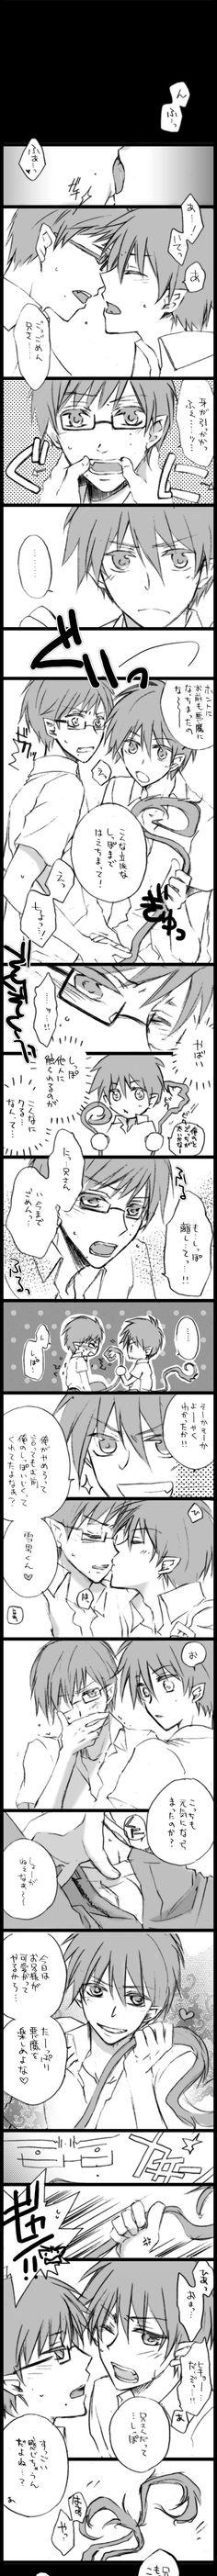 Tags: Anime, Incest, Twincest, Kiss On The Cheek, Ao no Exorcist, Okumura Rin, Okumura Yukio